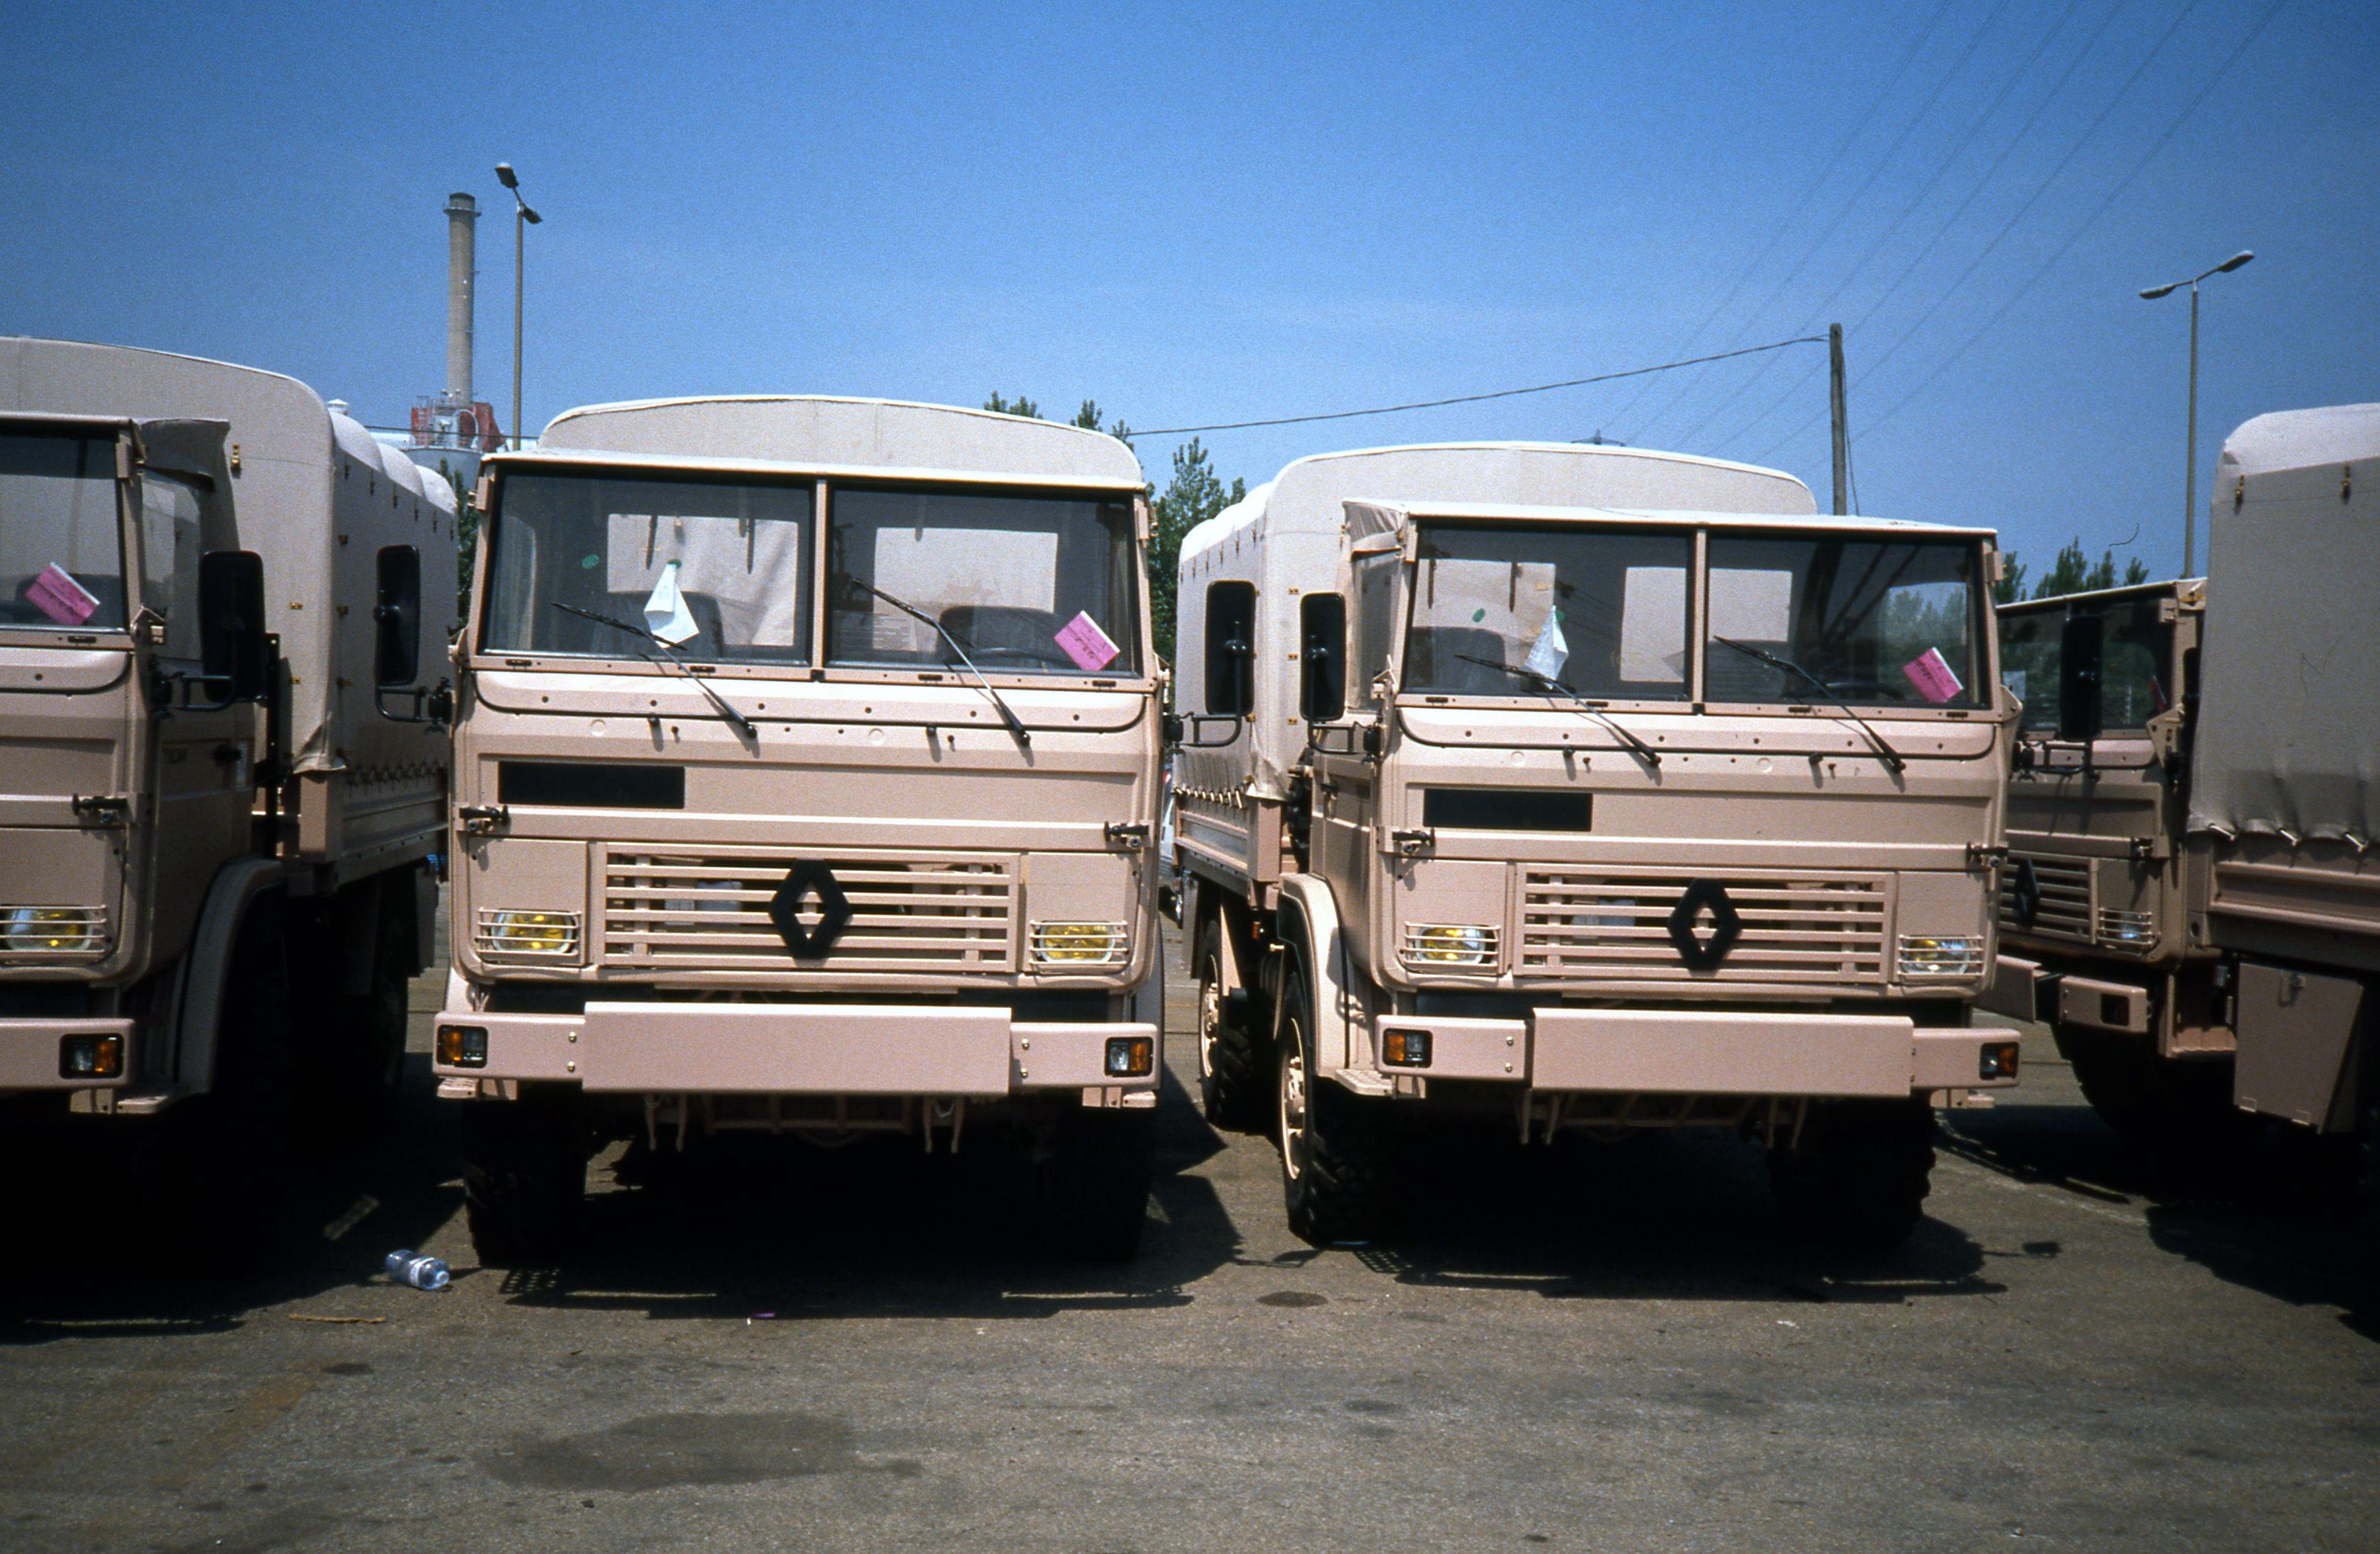 Photos - Logistique et Camions / Logistics and Trucks - Page 6 34872139606_9f9b2d4000_o